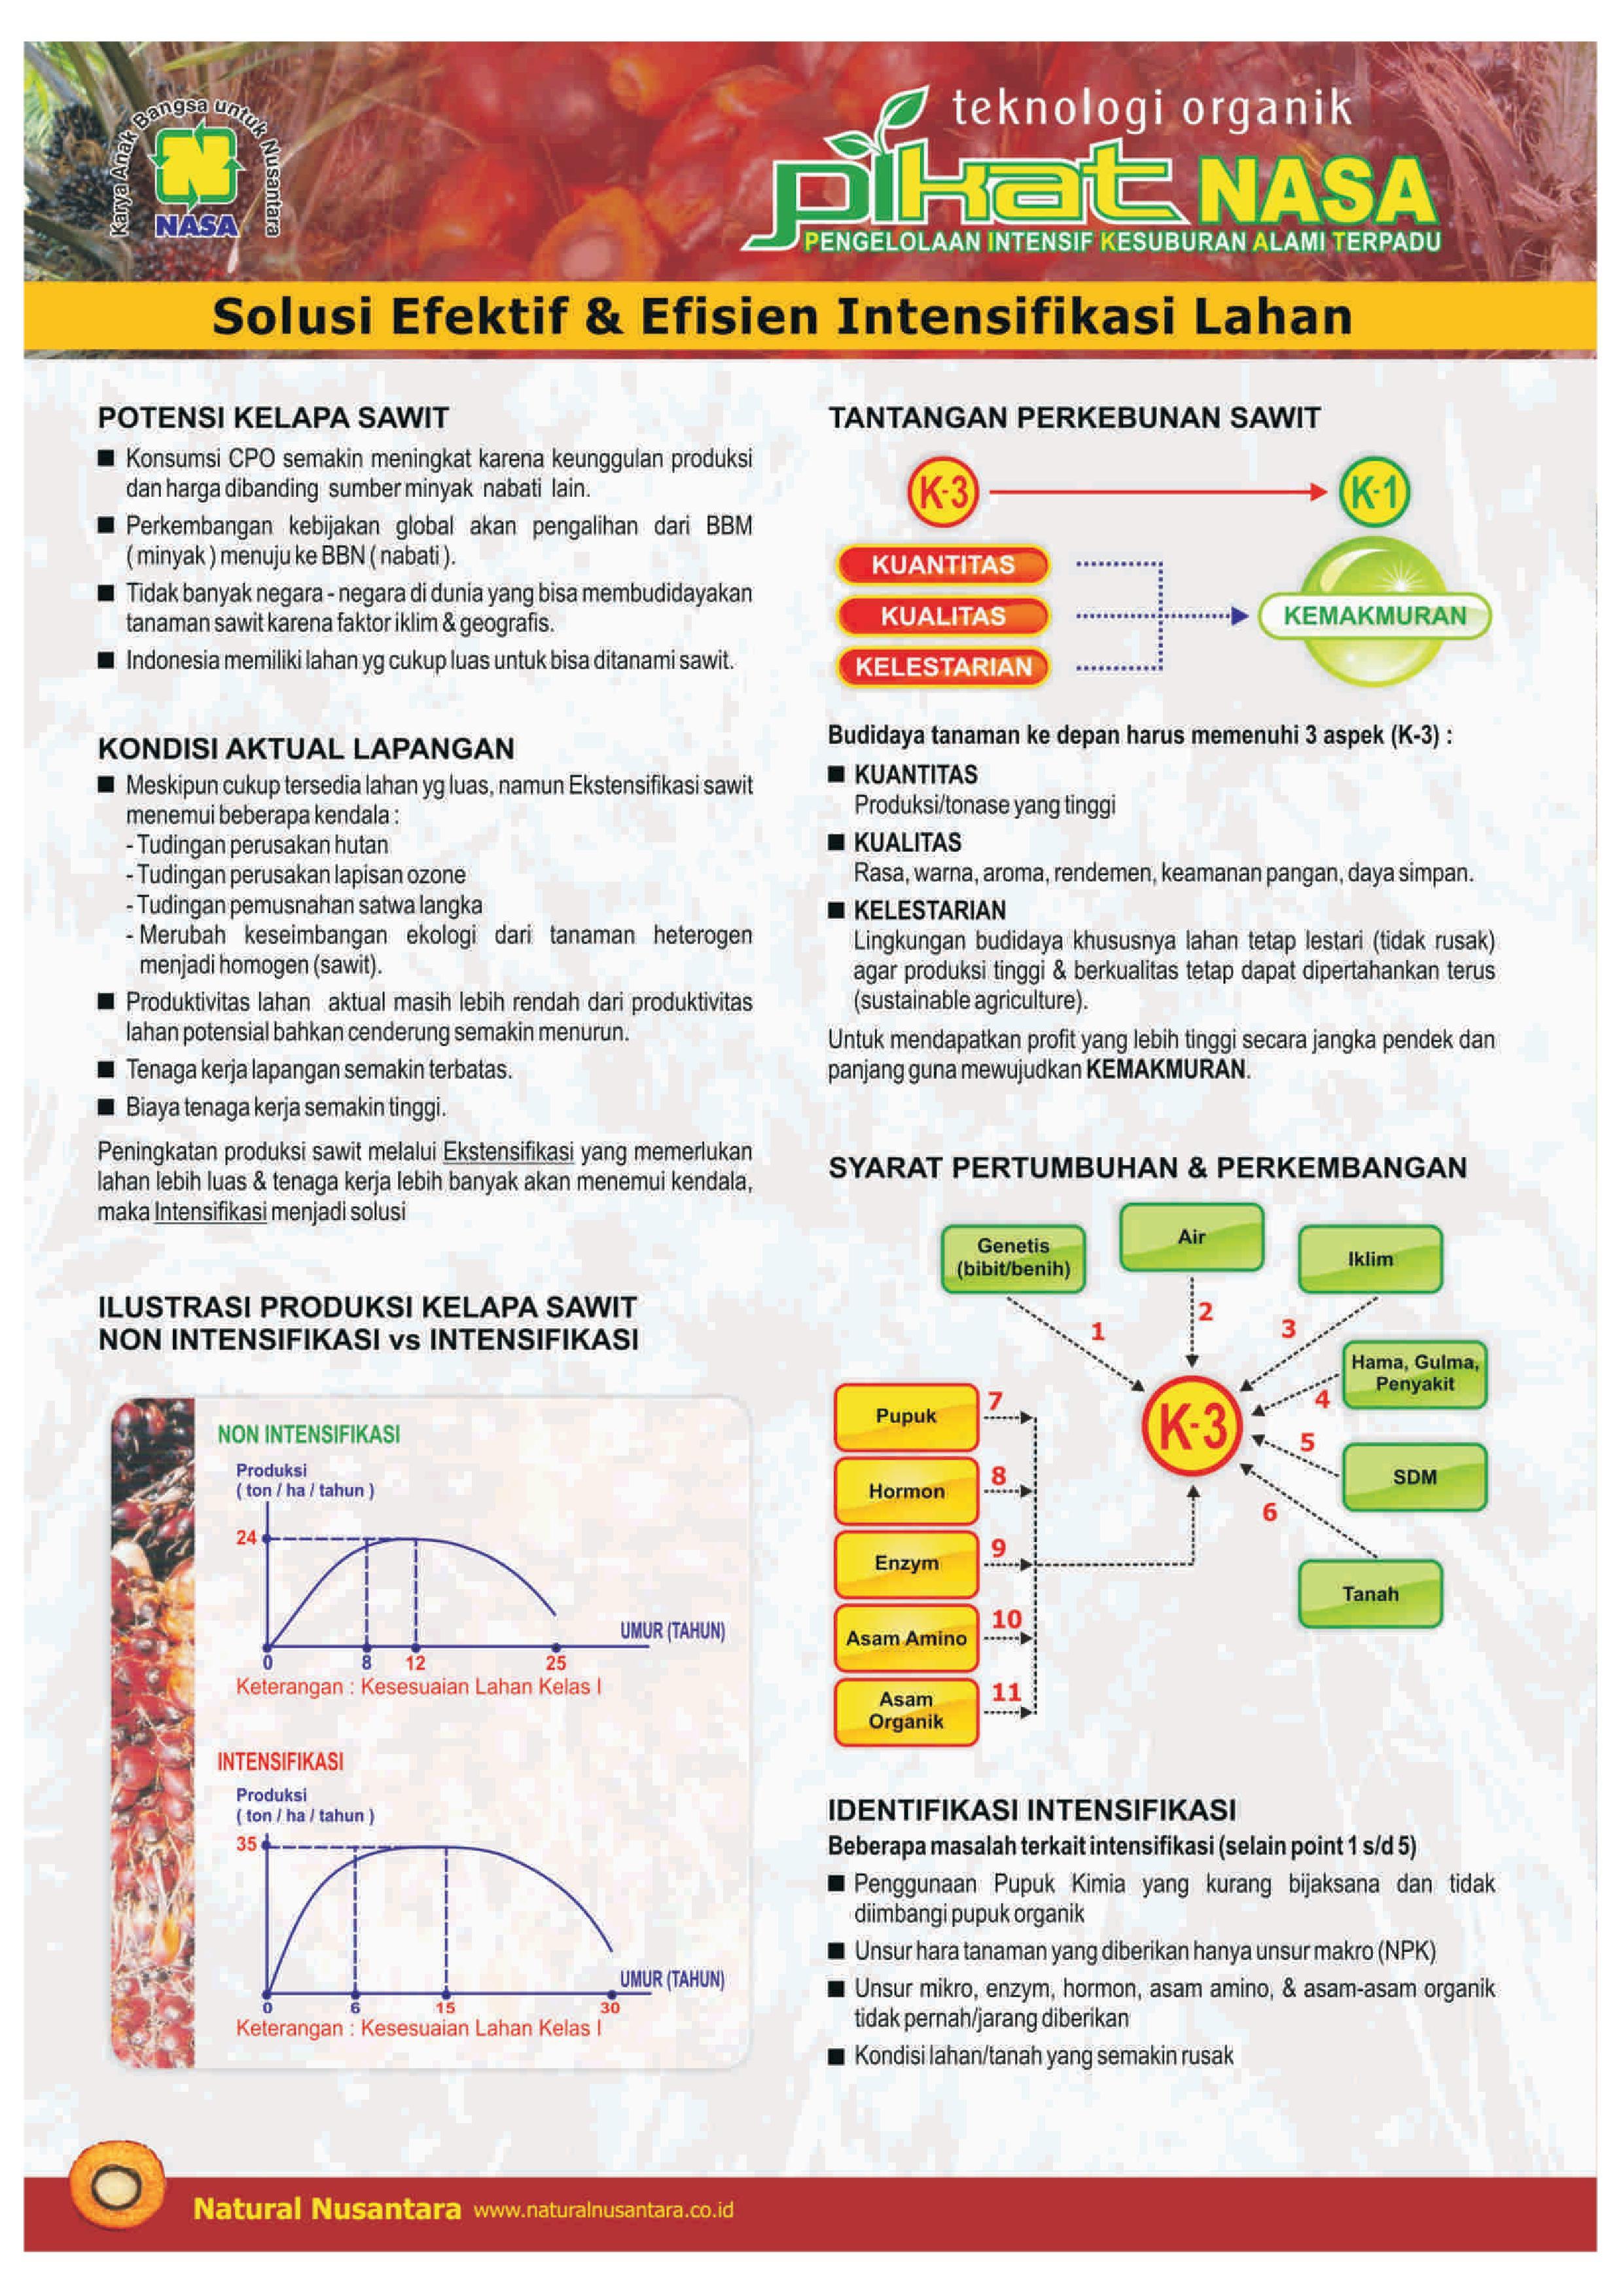 proposal-sawit-pt-nasa-page-002